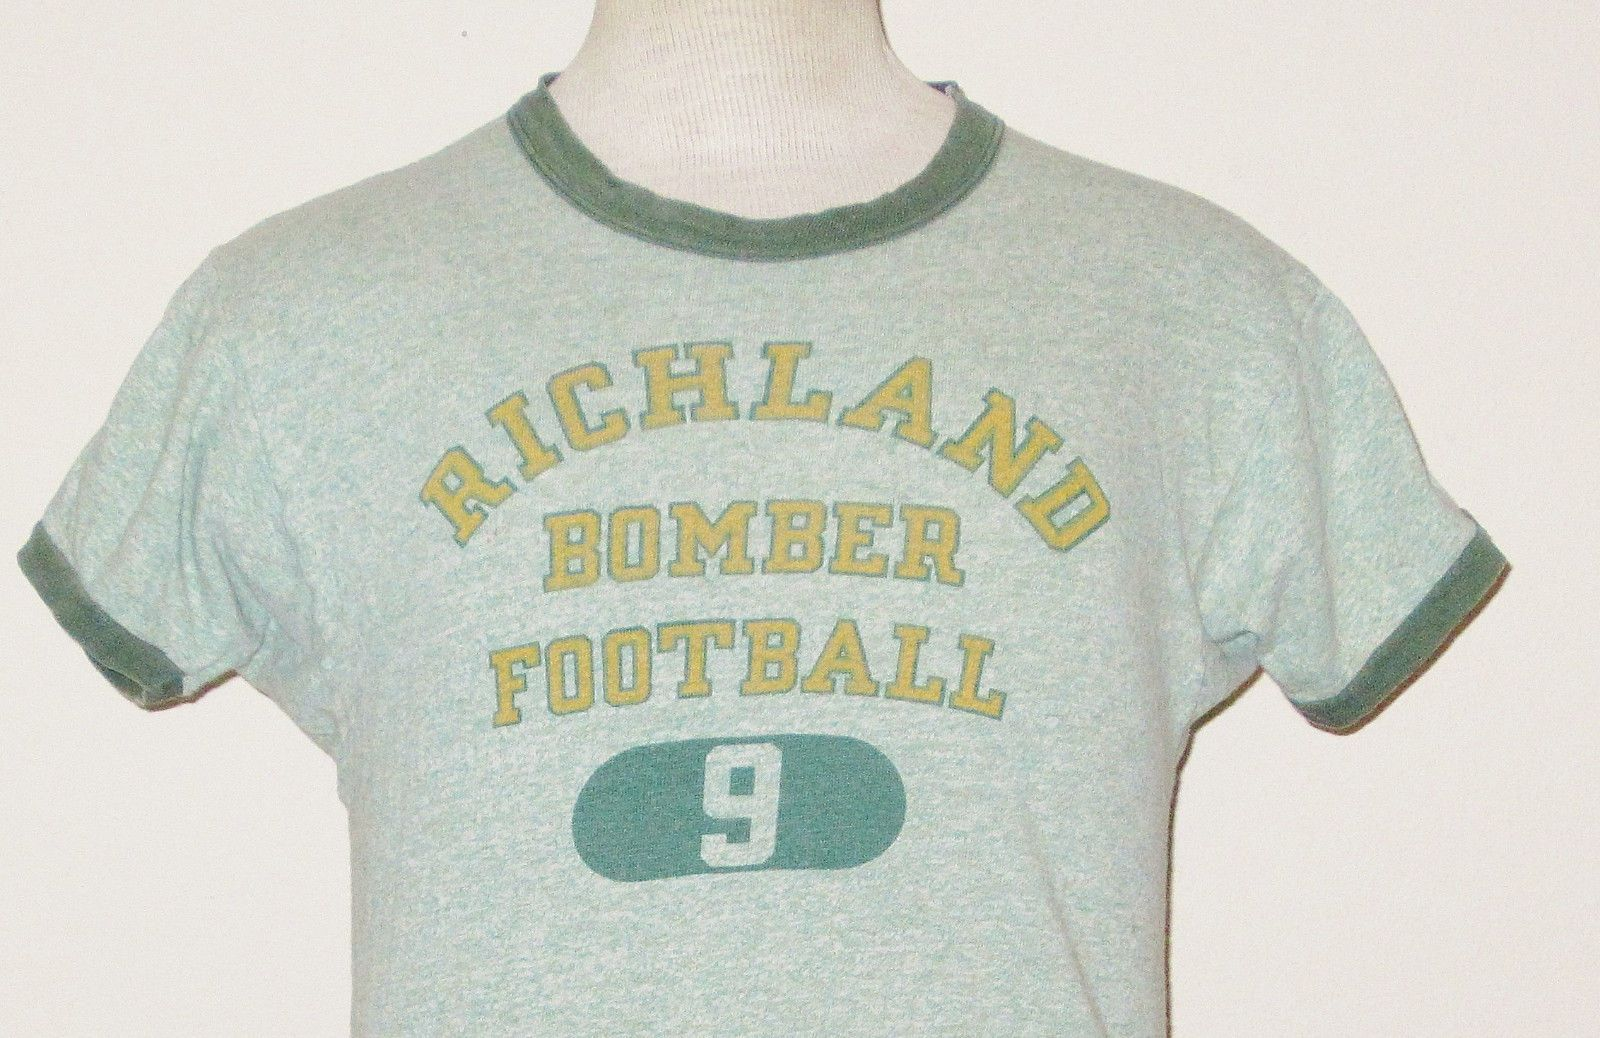 Vtg 50's Champion Richland Bombers Football Ringer Athletic Small T Shirt | eBay